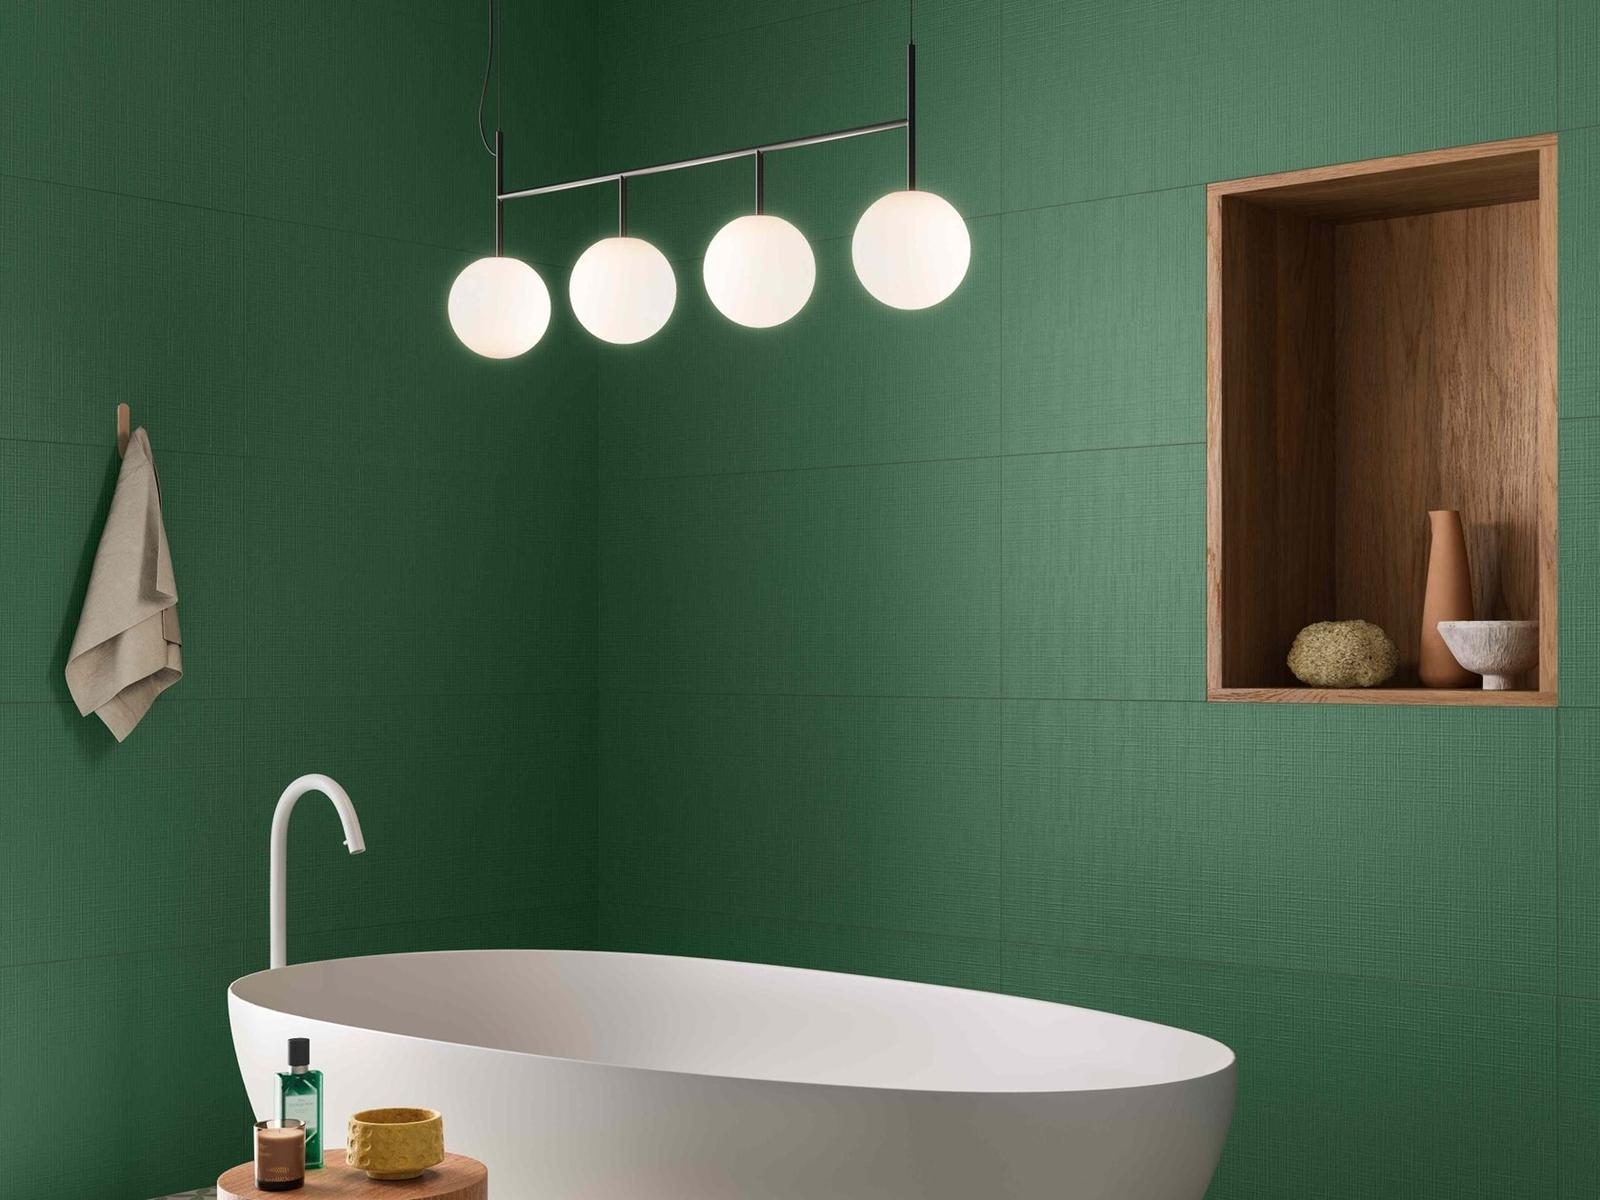 Zelená v kúpeľni - Obrázok č. 22